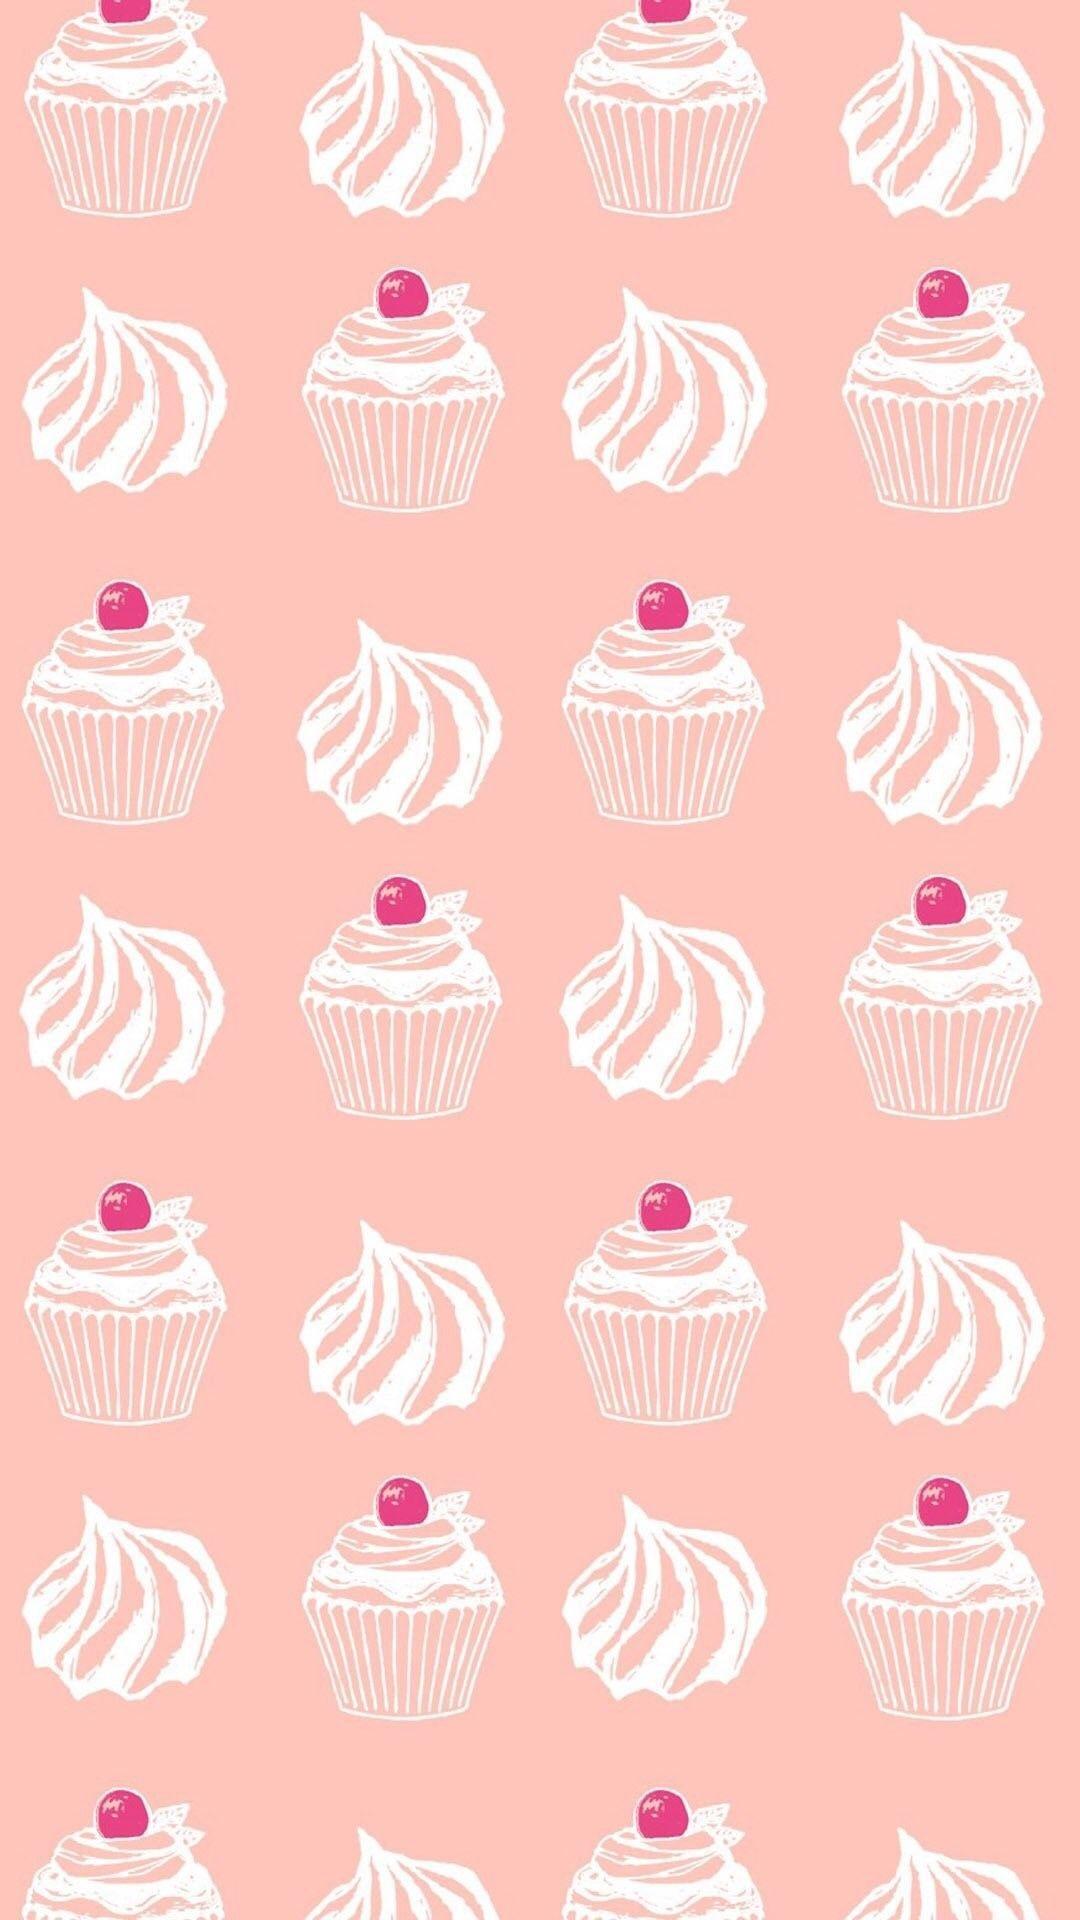 Kawaii Cupcake Wallpapers - Wallpaper Cave